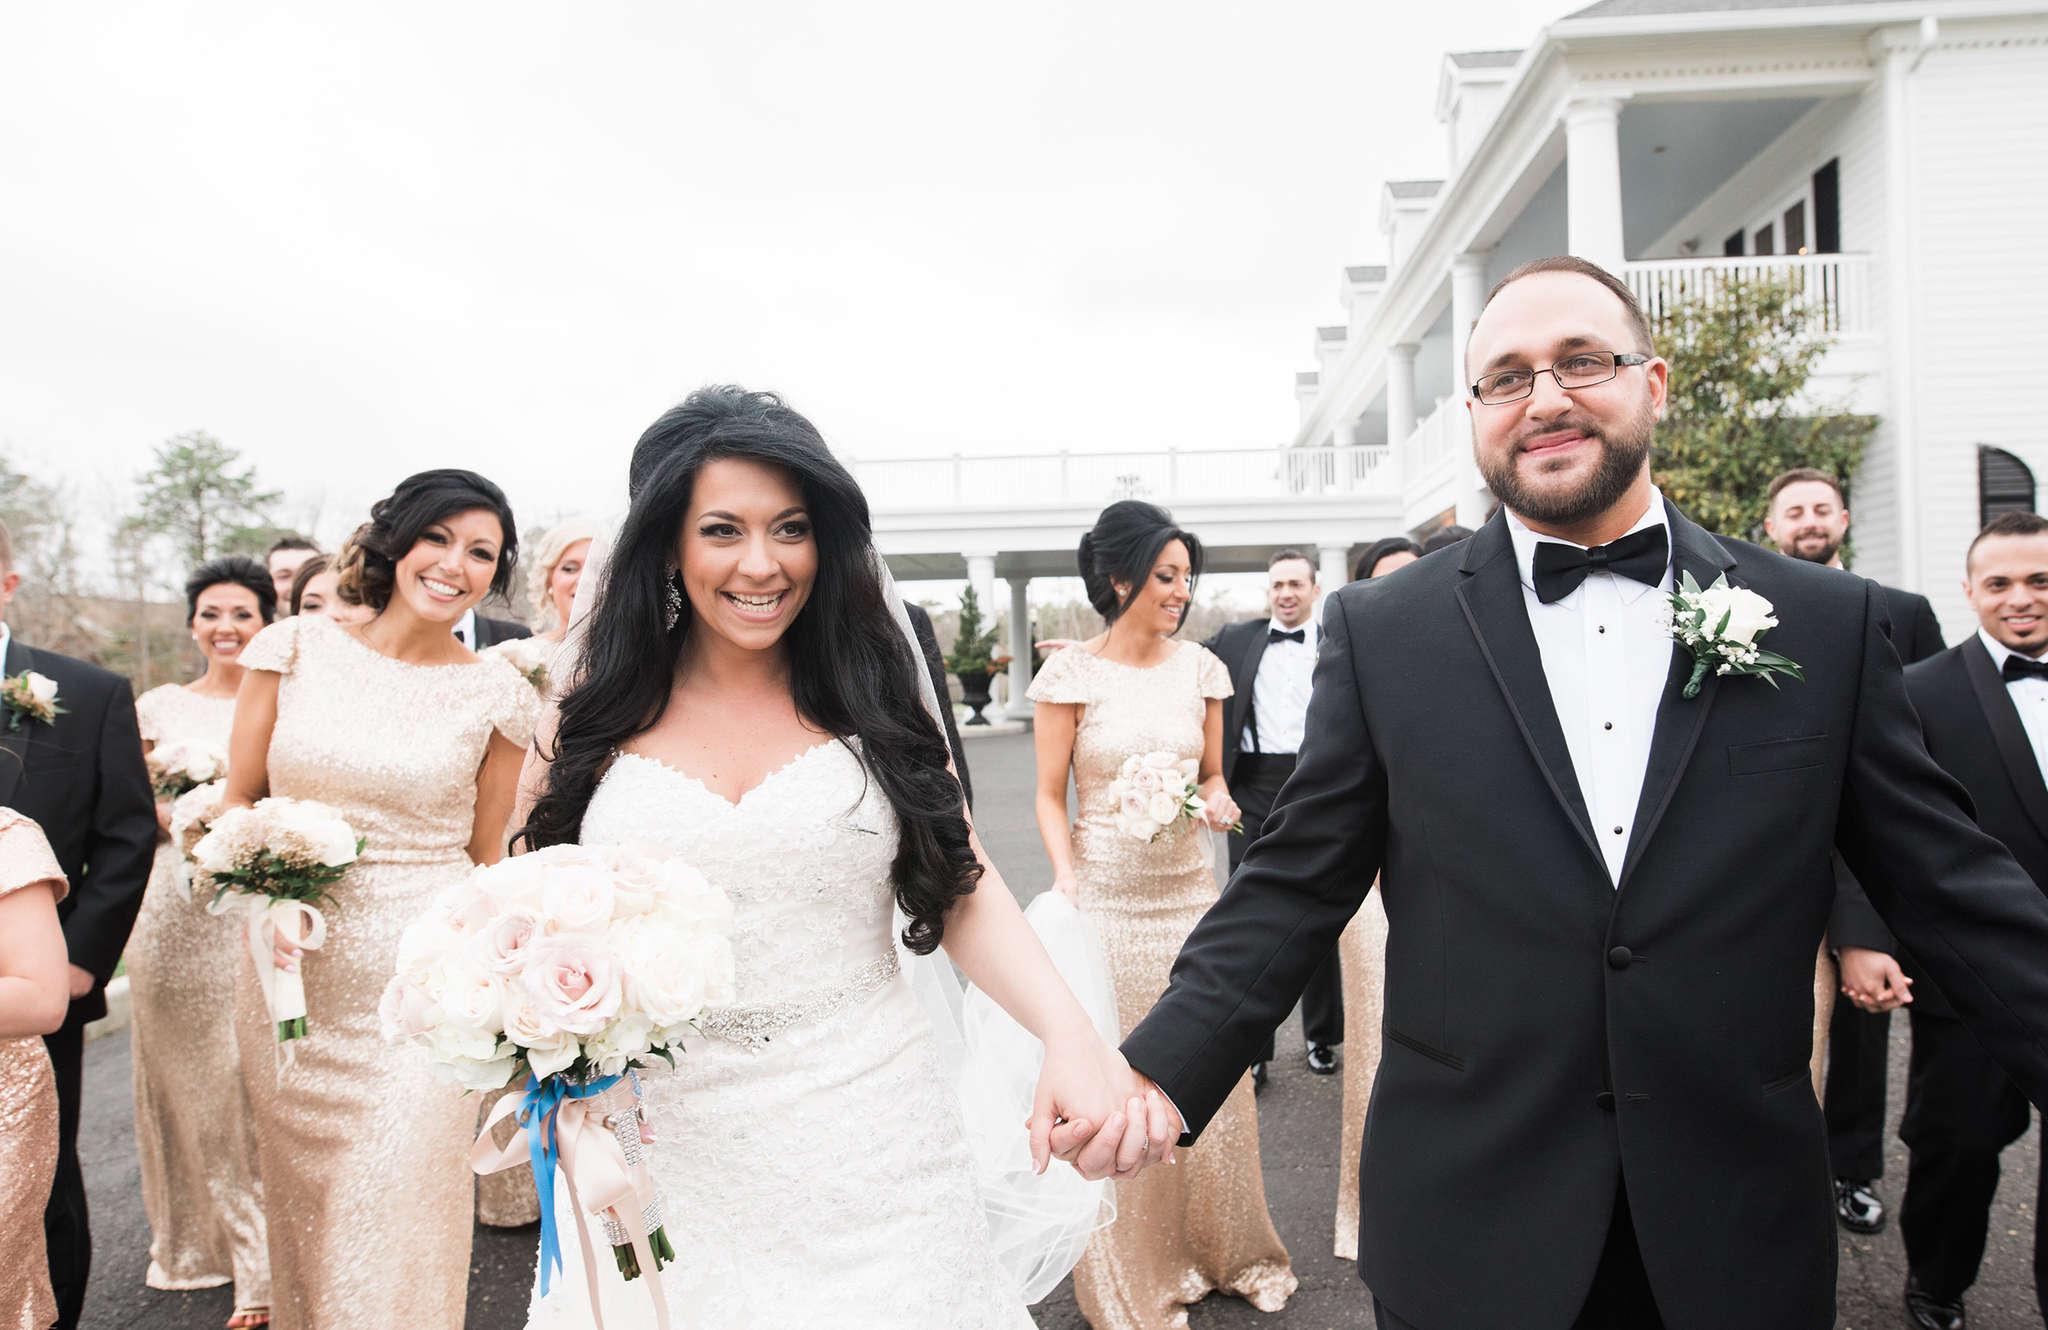 Jenna Chiarulli and Anthony Marchiano Ashlee Mintz Photography